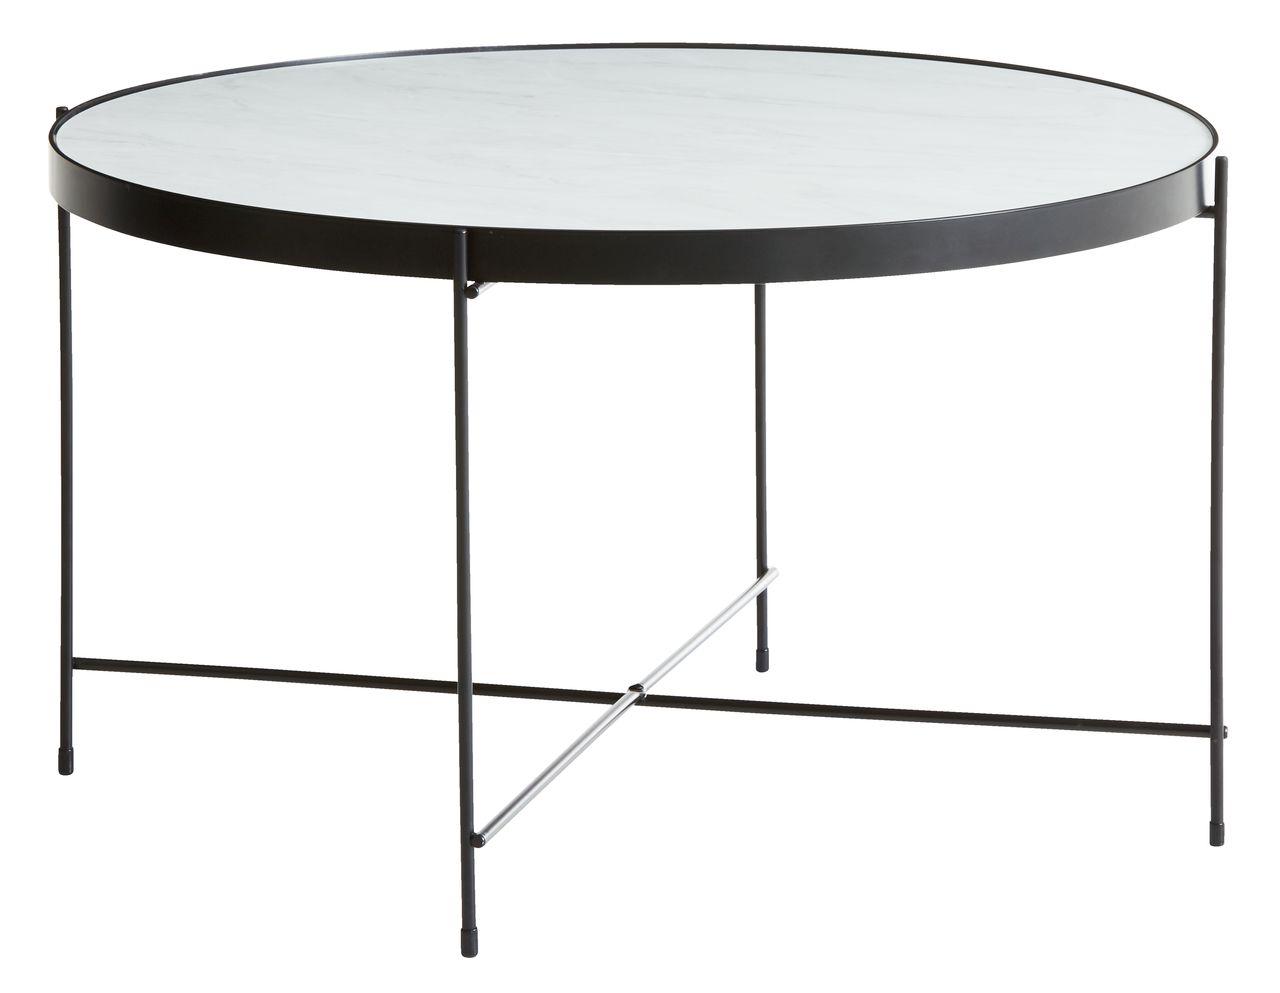 Terrific Coffee Table Hadbjerg D70 Cm Oak Black Andrewgaddart Wooden Chair Designs For Living Room Andrewgaddartcom